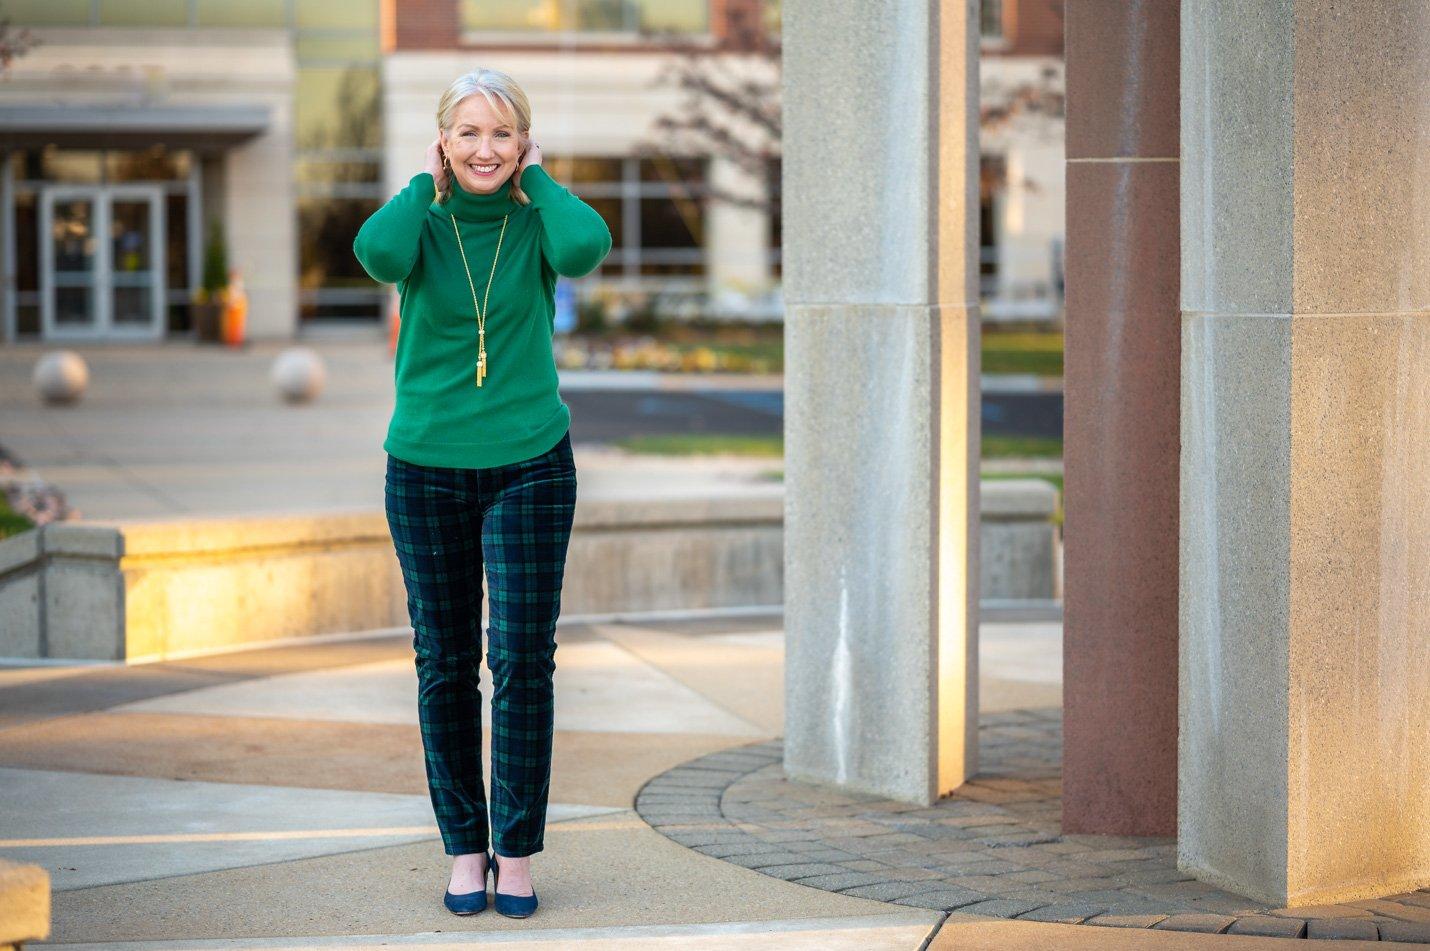 Tartan Plaid Pants for Women over 50